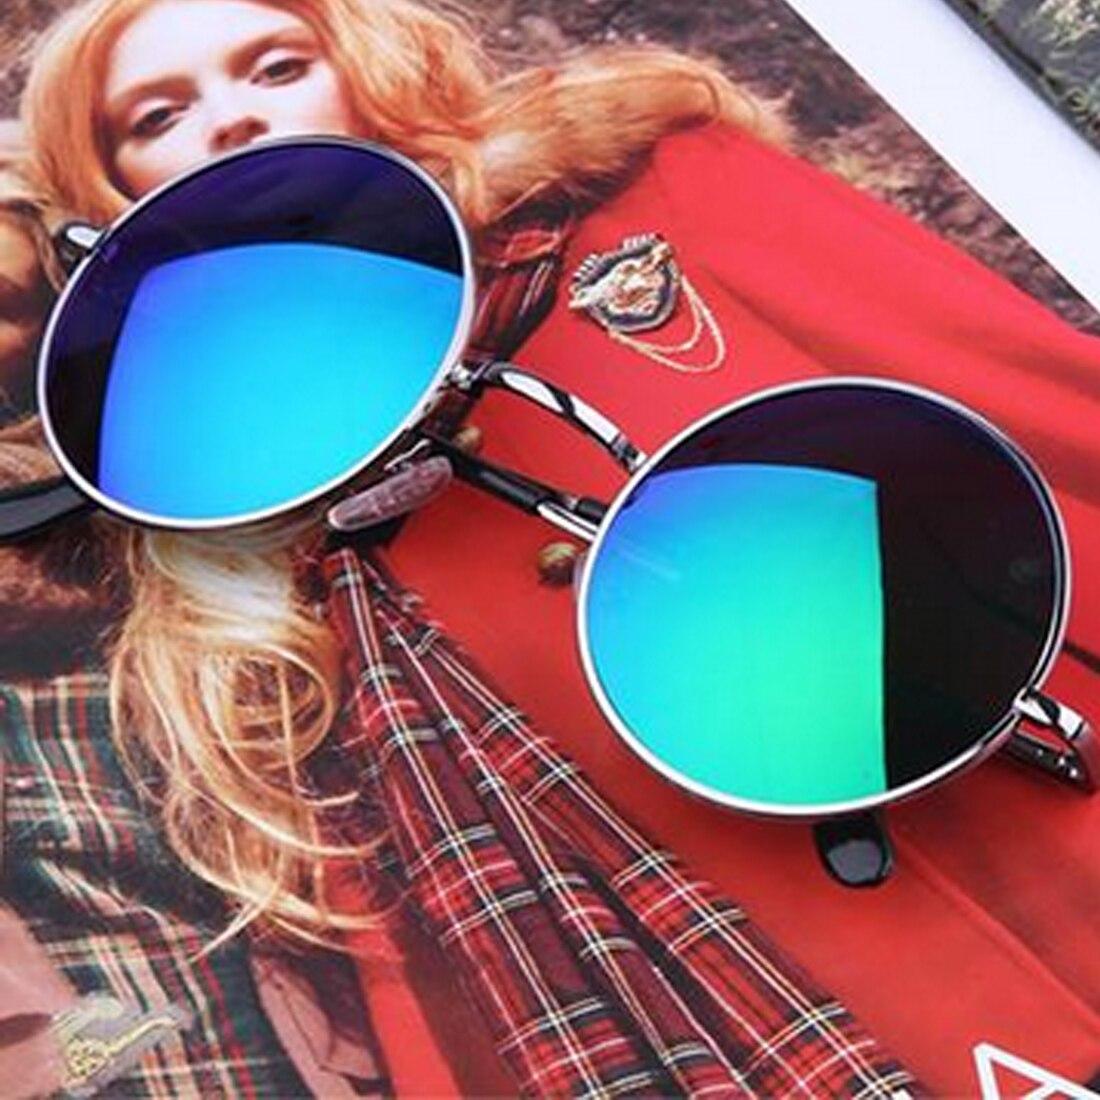 Fashion Round Metal Frame Eyeglasses Frames Women Men Sunglasses Fake Myopia Eyeglasses Polarized glasses in Men 39 s Eyewear Frames from Apparel Accessories